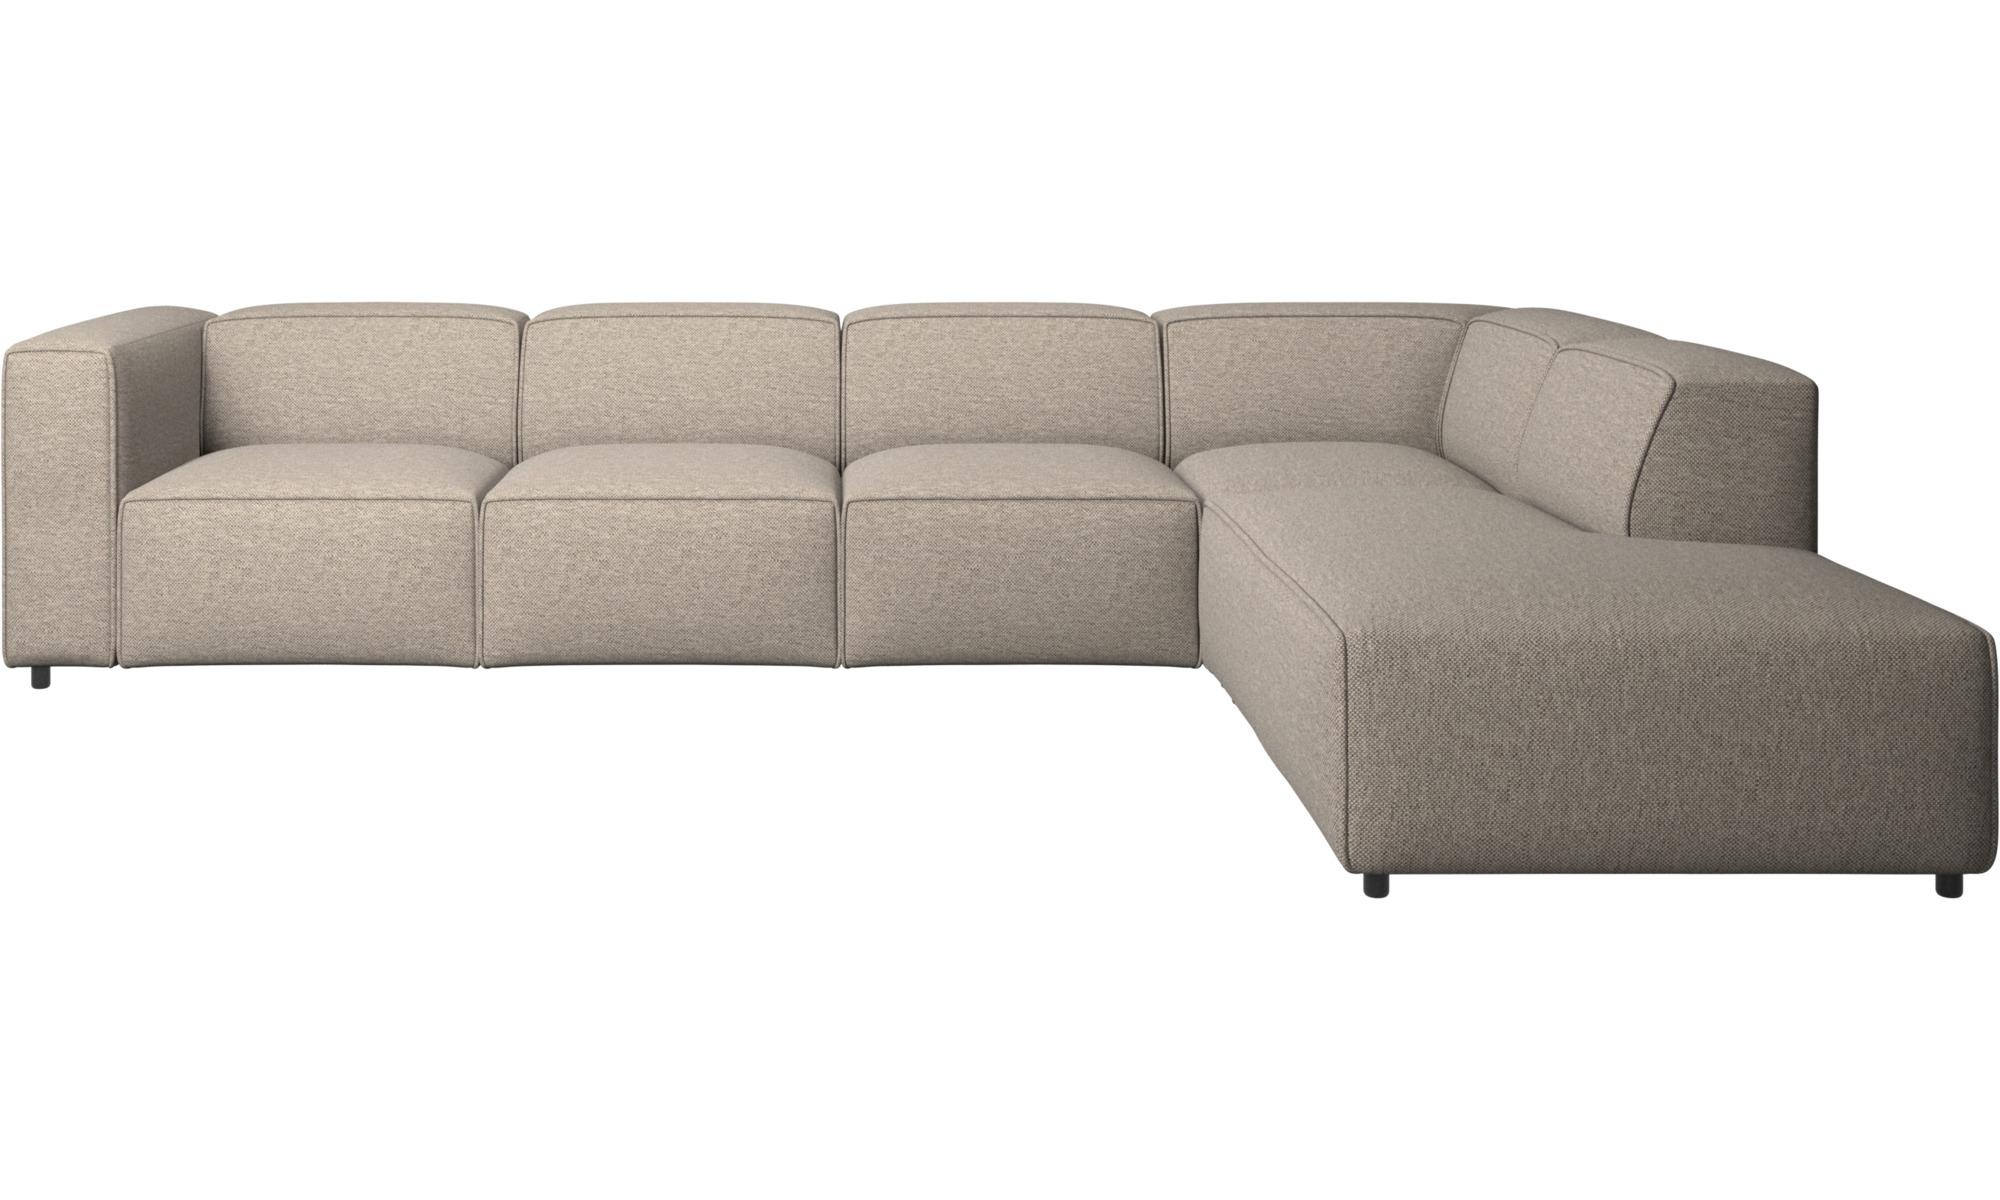 Modulare Sofas - Carmo Ecksofa mit Loungemodul - Beige - Stoff